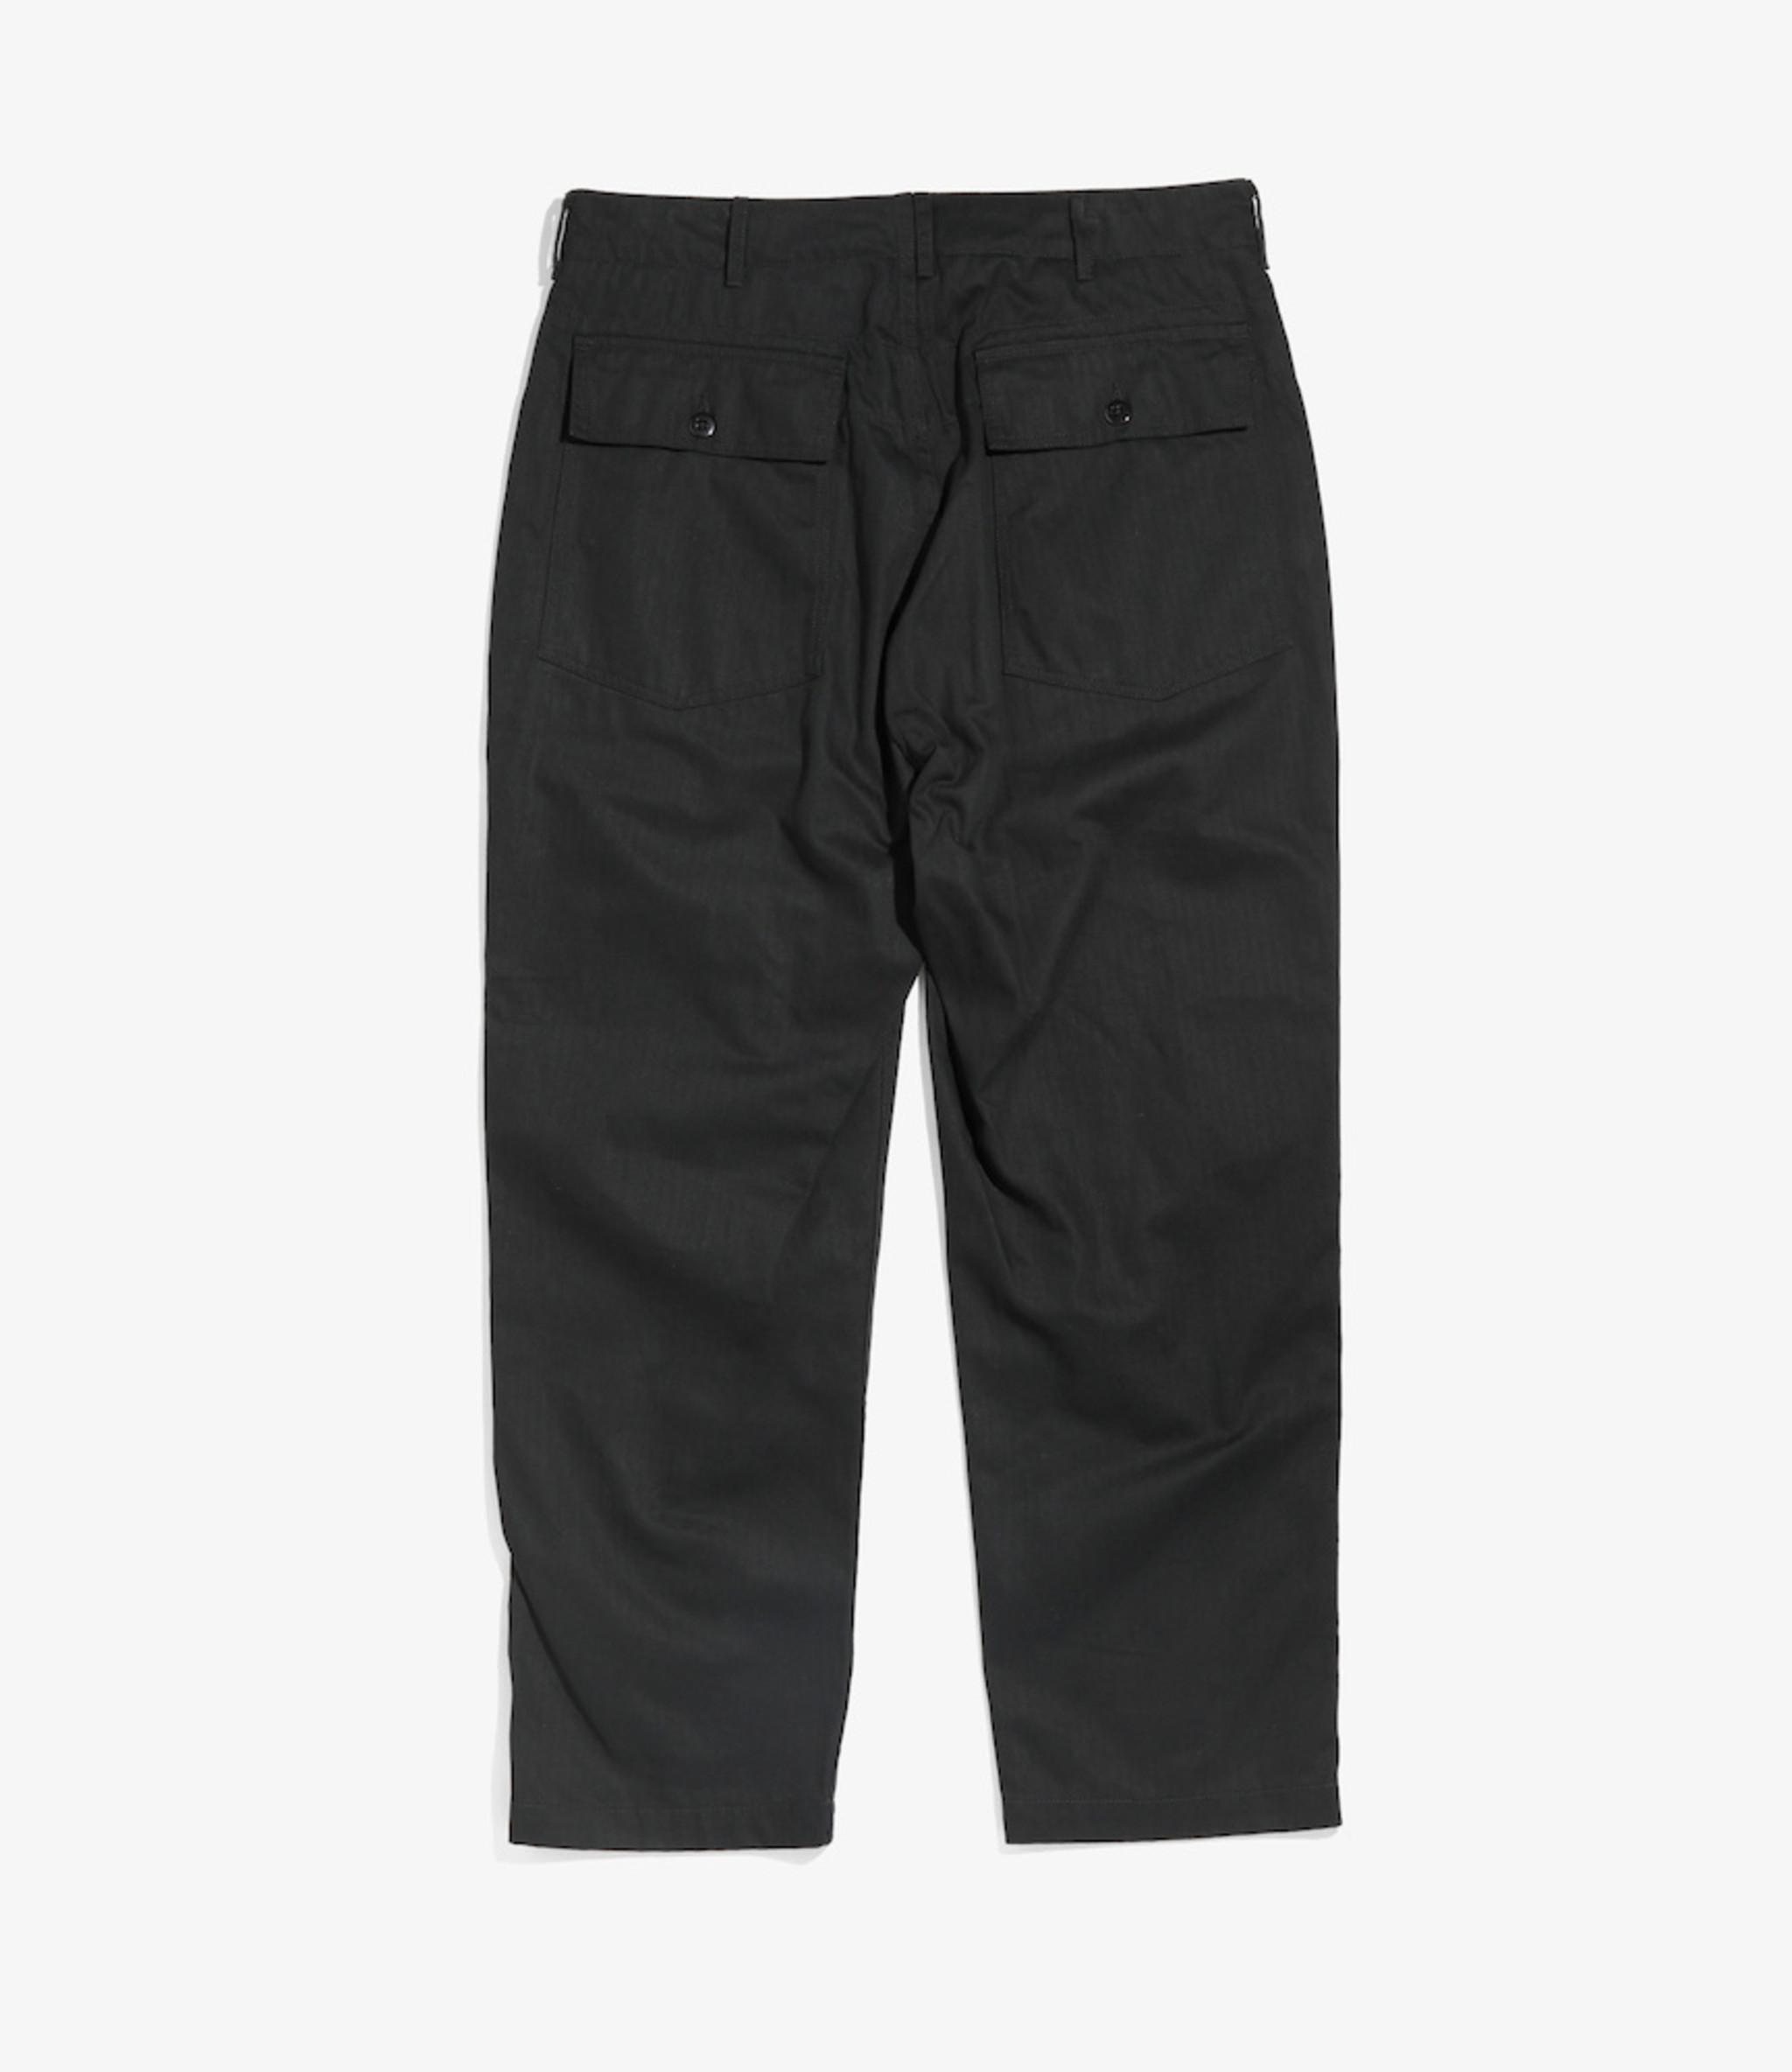 Engineered Garments Fatigue Pant - Black Cotton Heringbone Twill